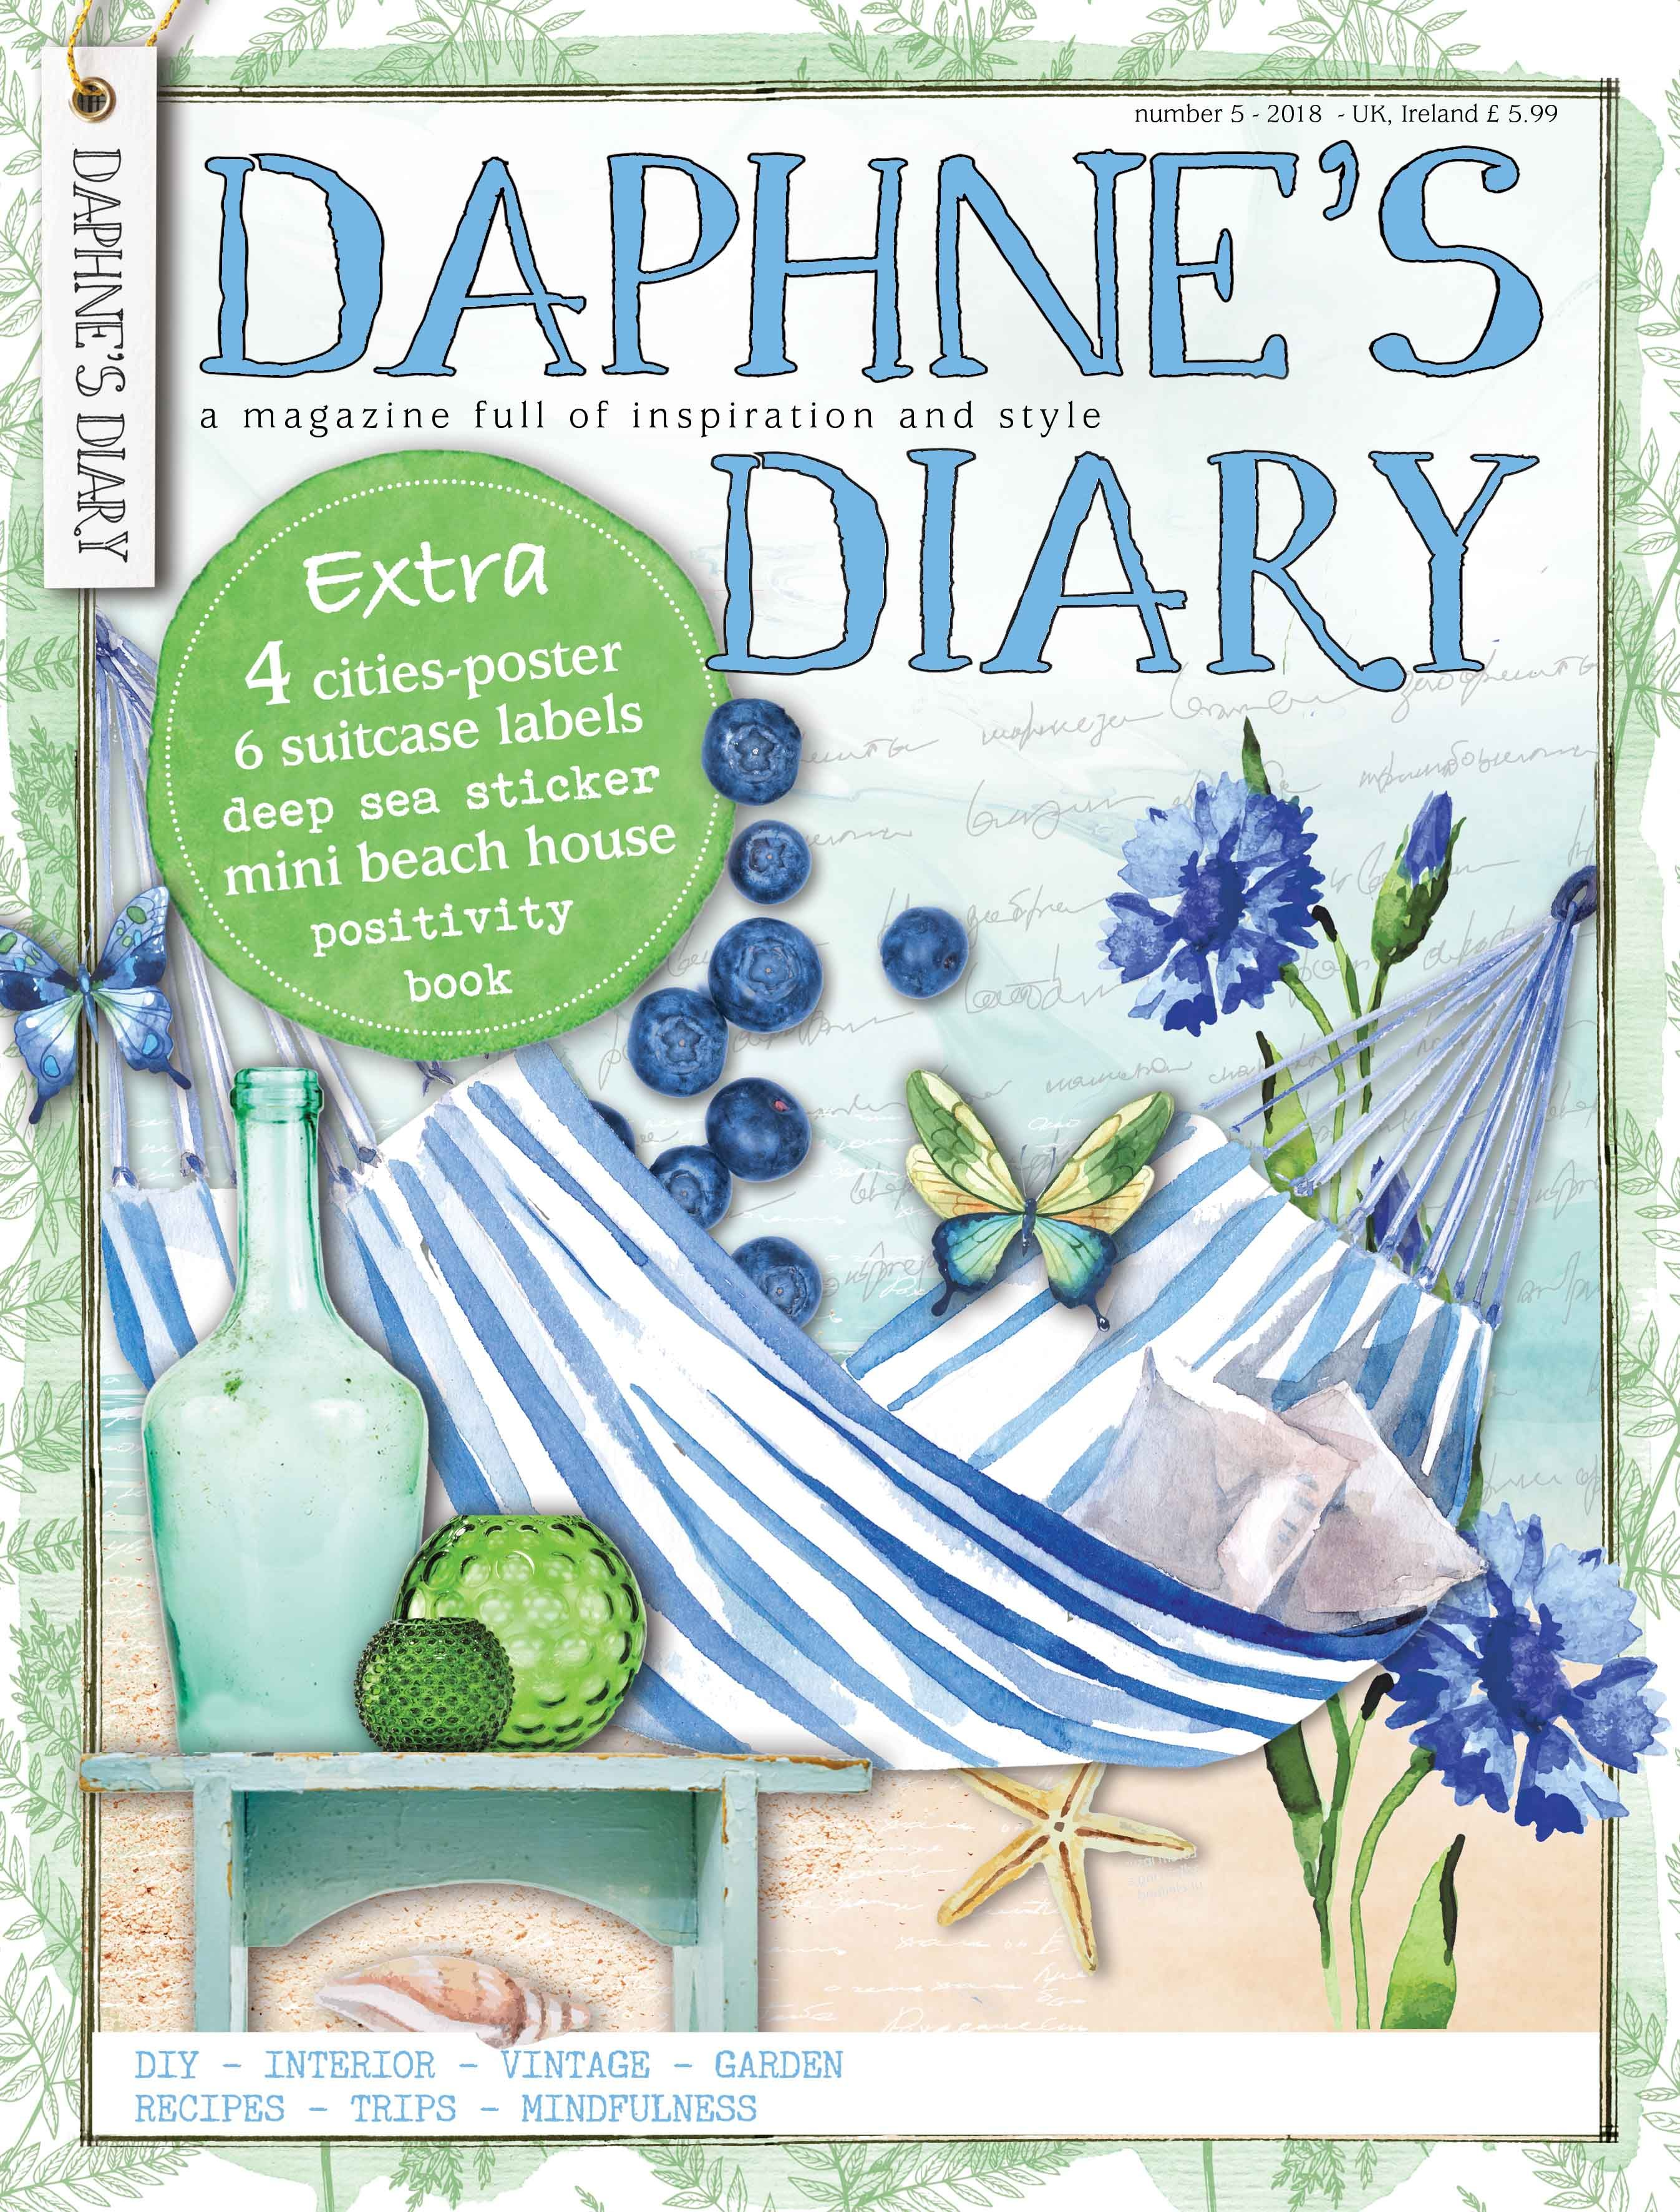 「Daphne's Diary English Covers」おしゃれまとめの人気アイデア Pinterest